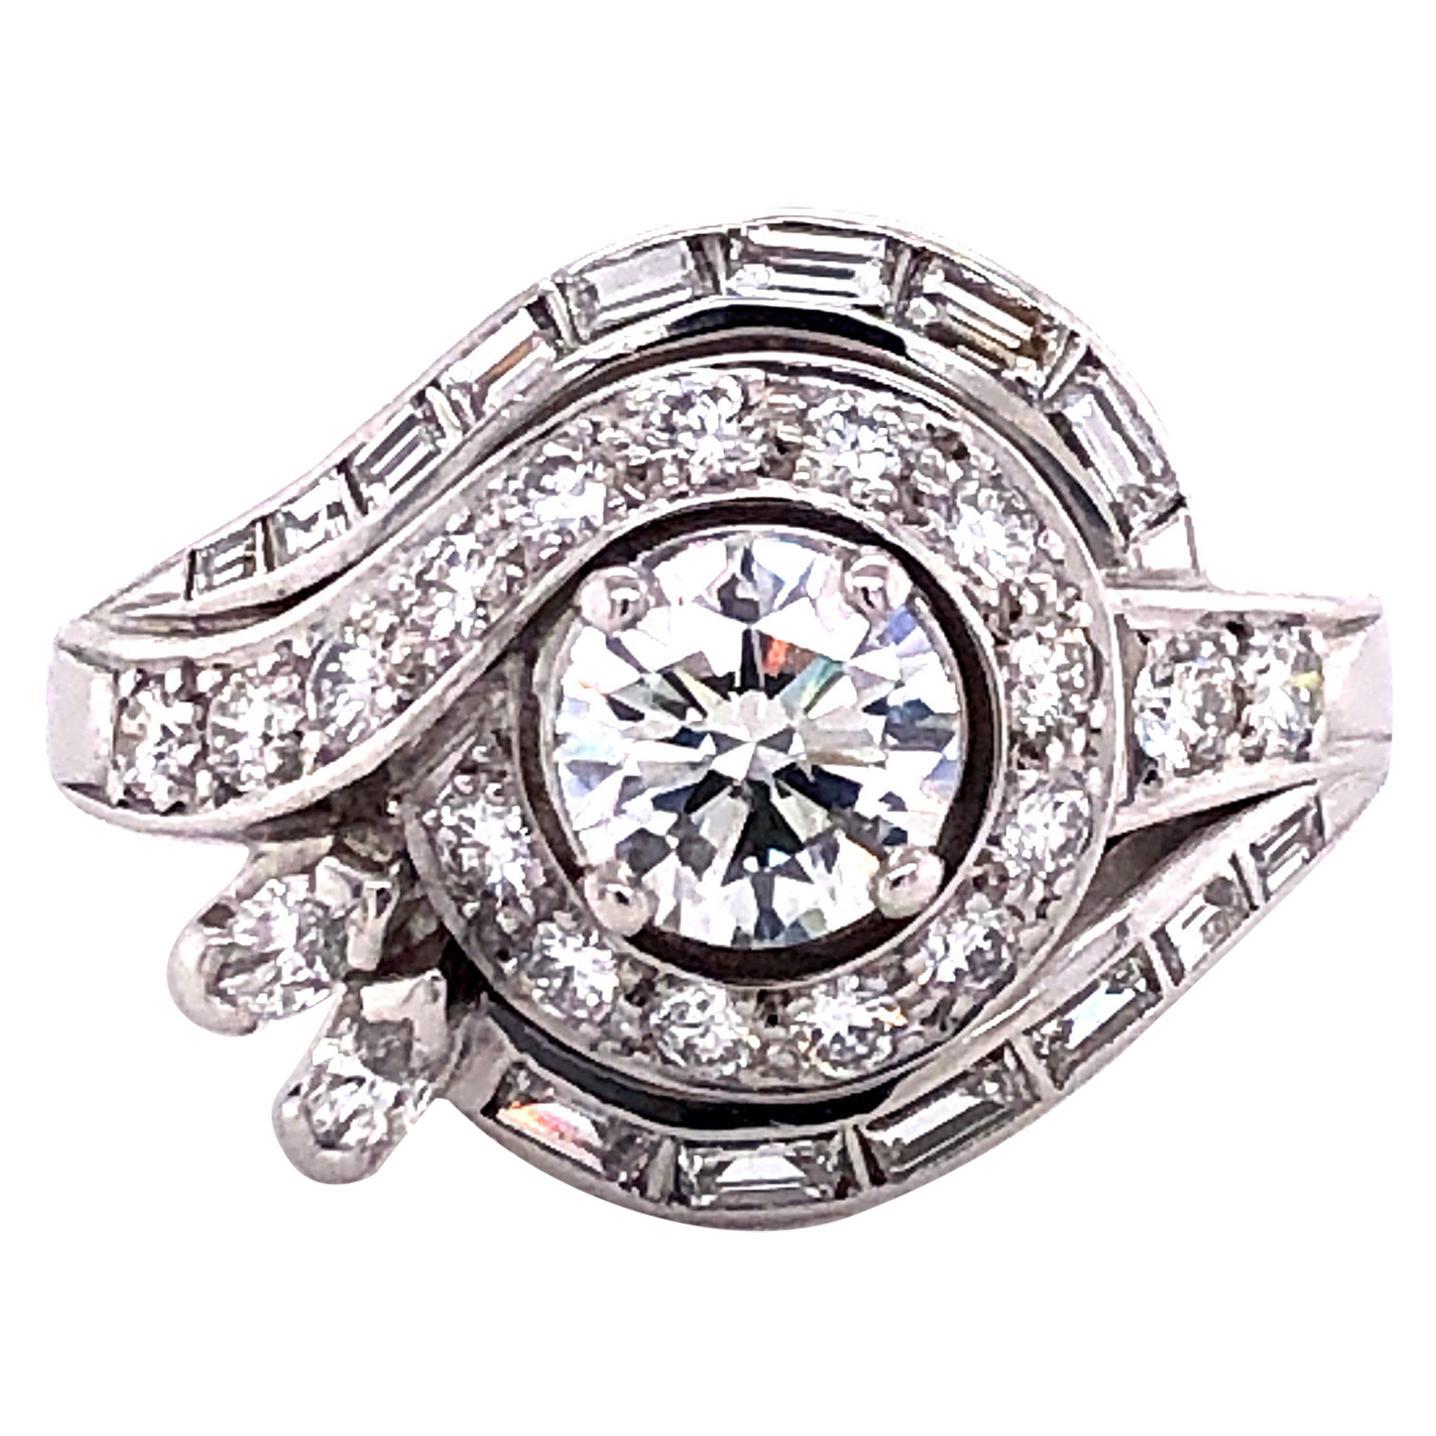 Diamond White Gold 750 Cocktail Ring